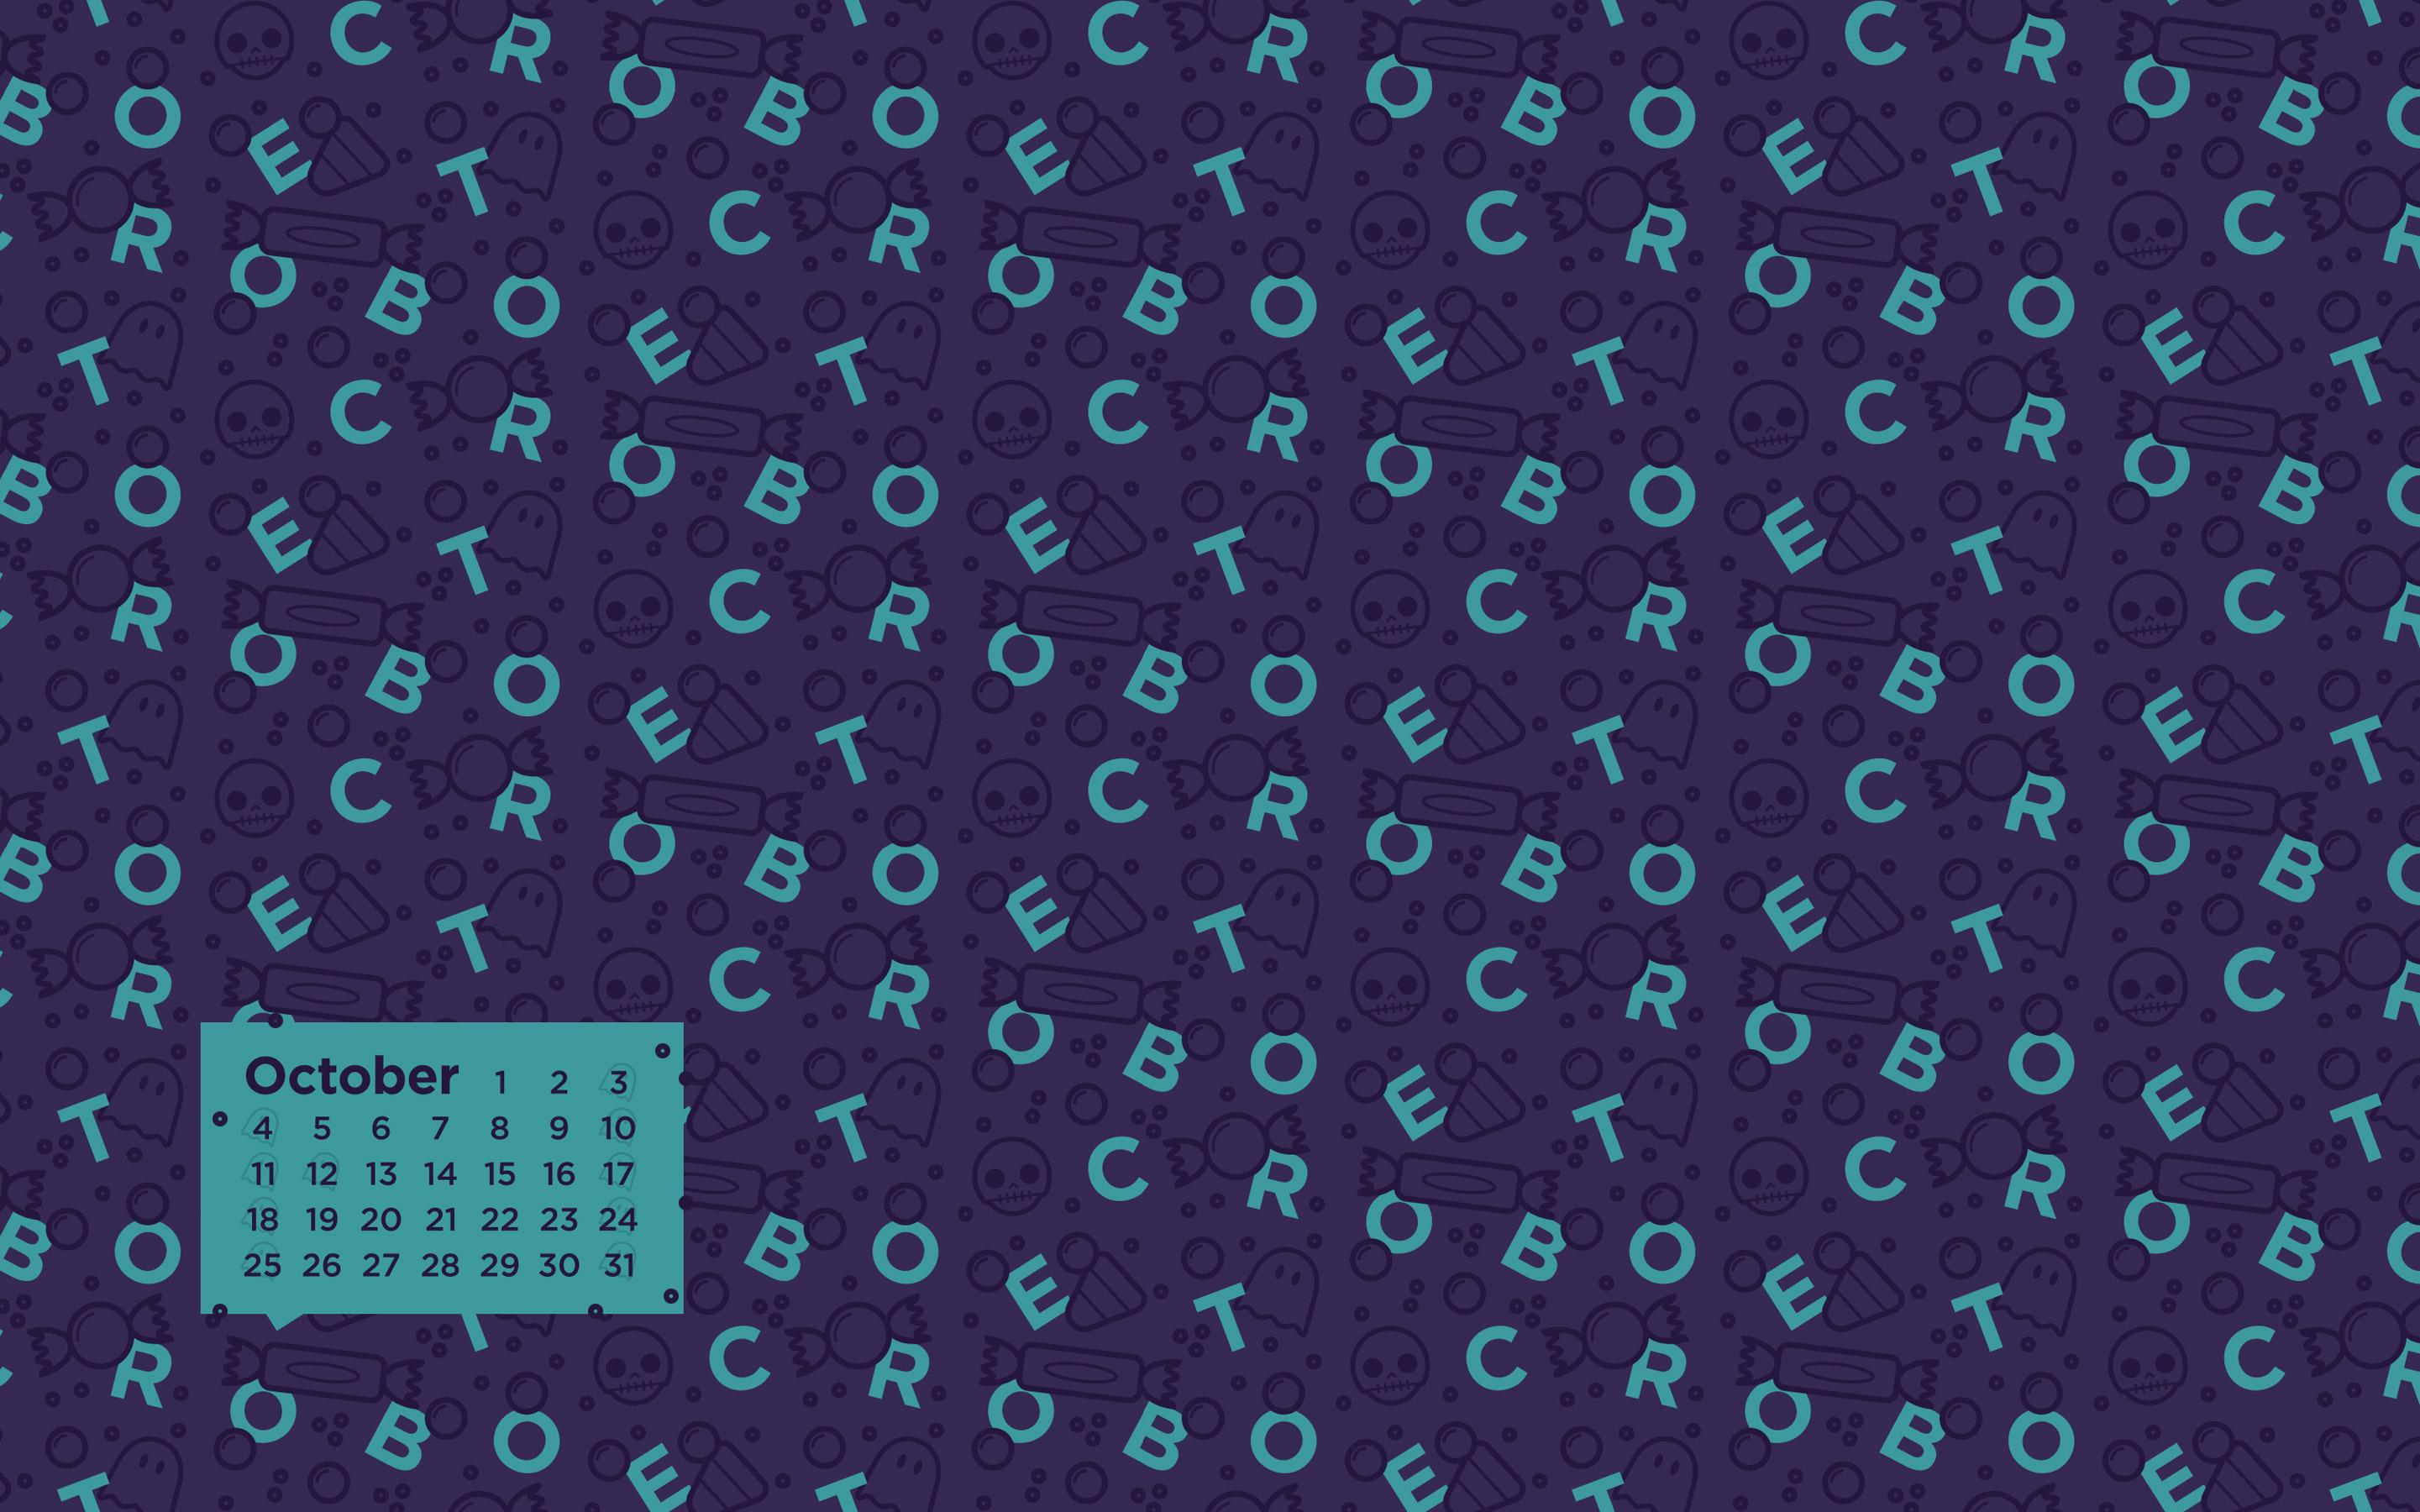 so you can download the October 2015 Desktop Calendar Wallpaper 2881x1800